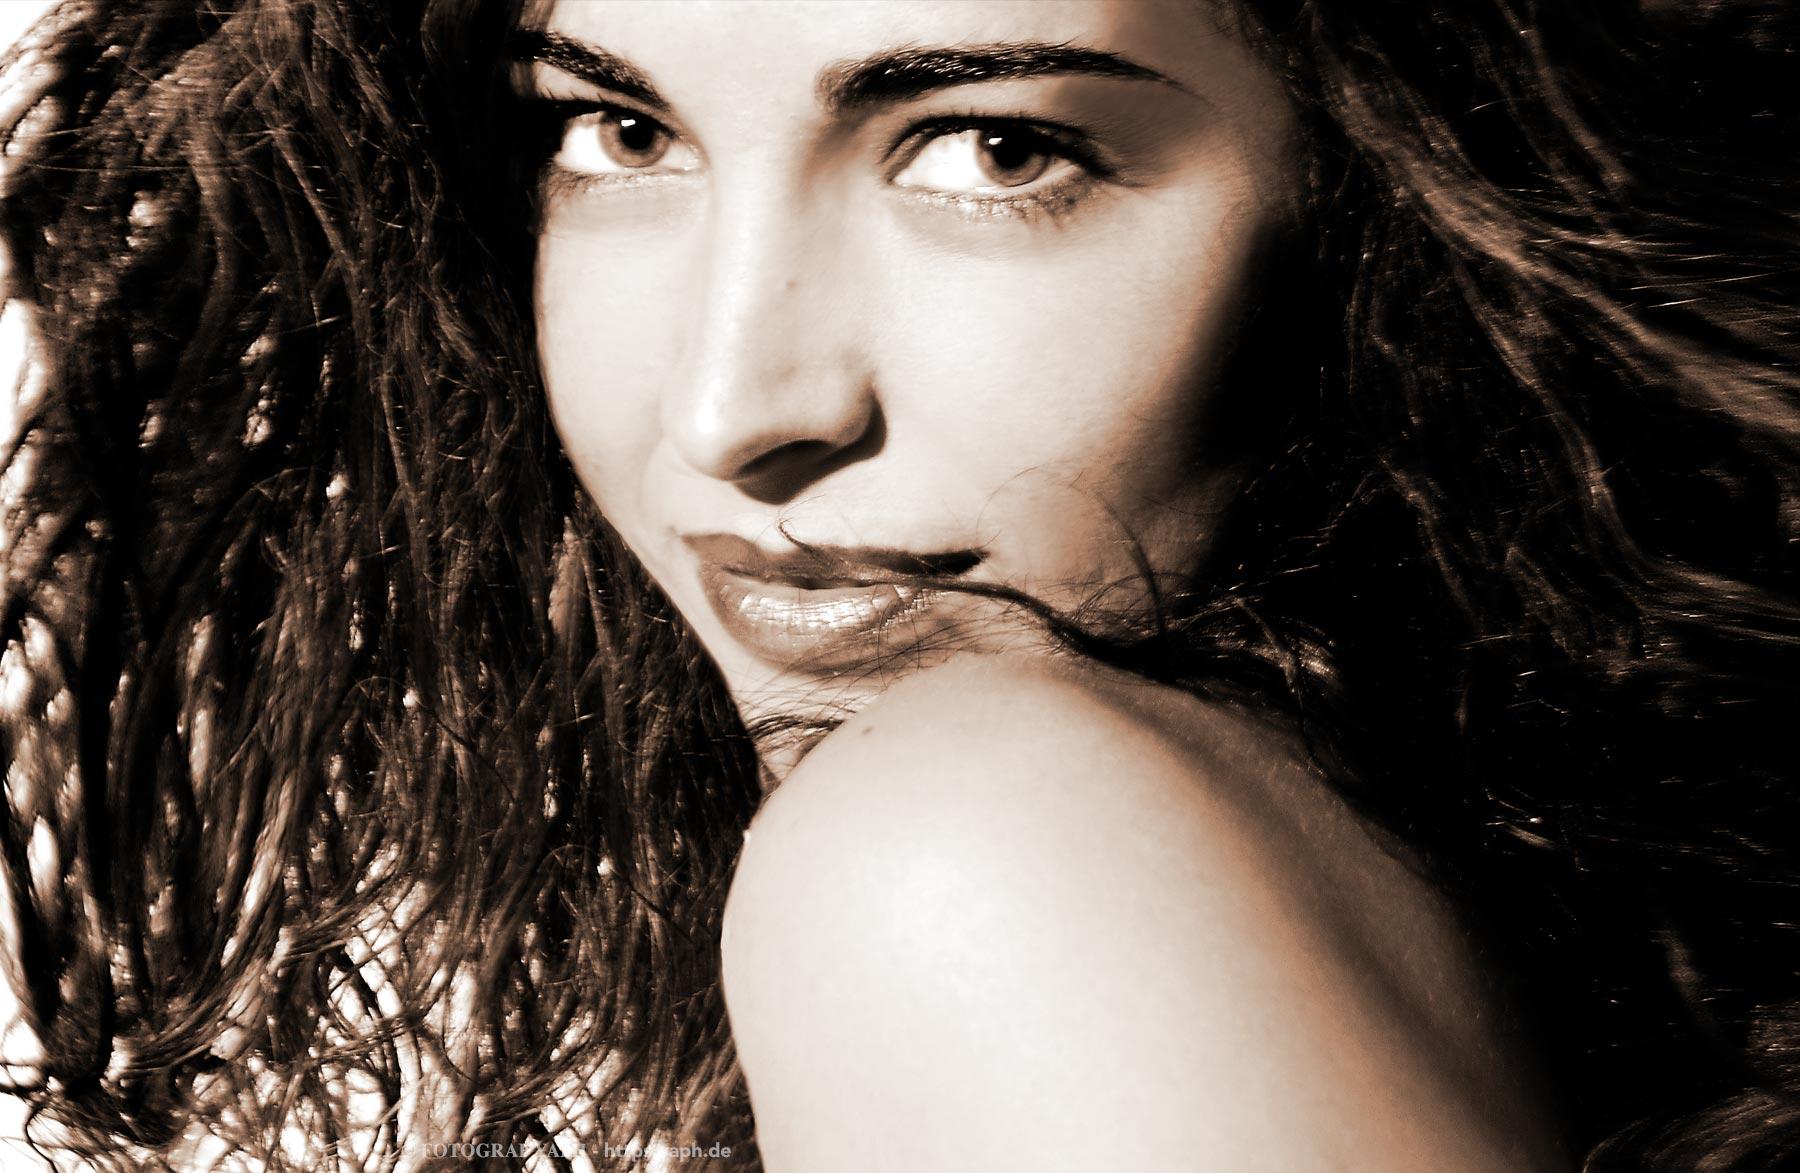 Diana Aktfotografie Choreographie - Yaph - Trier